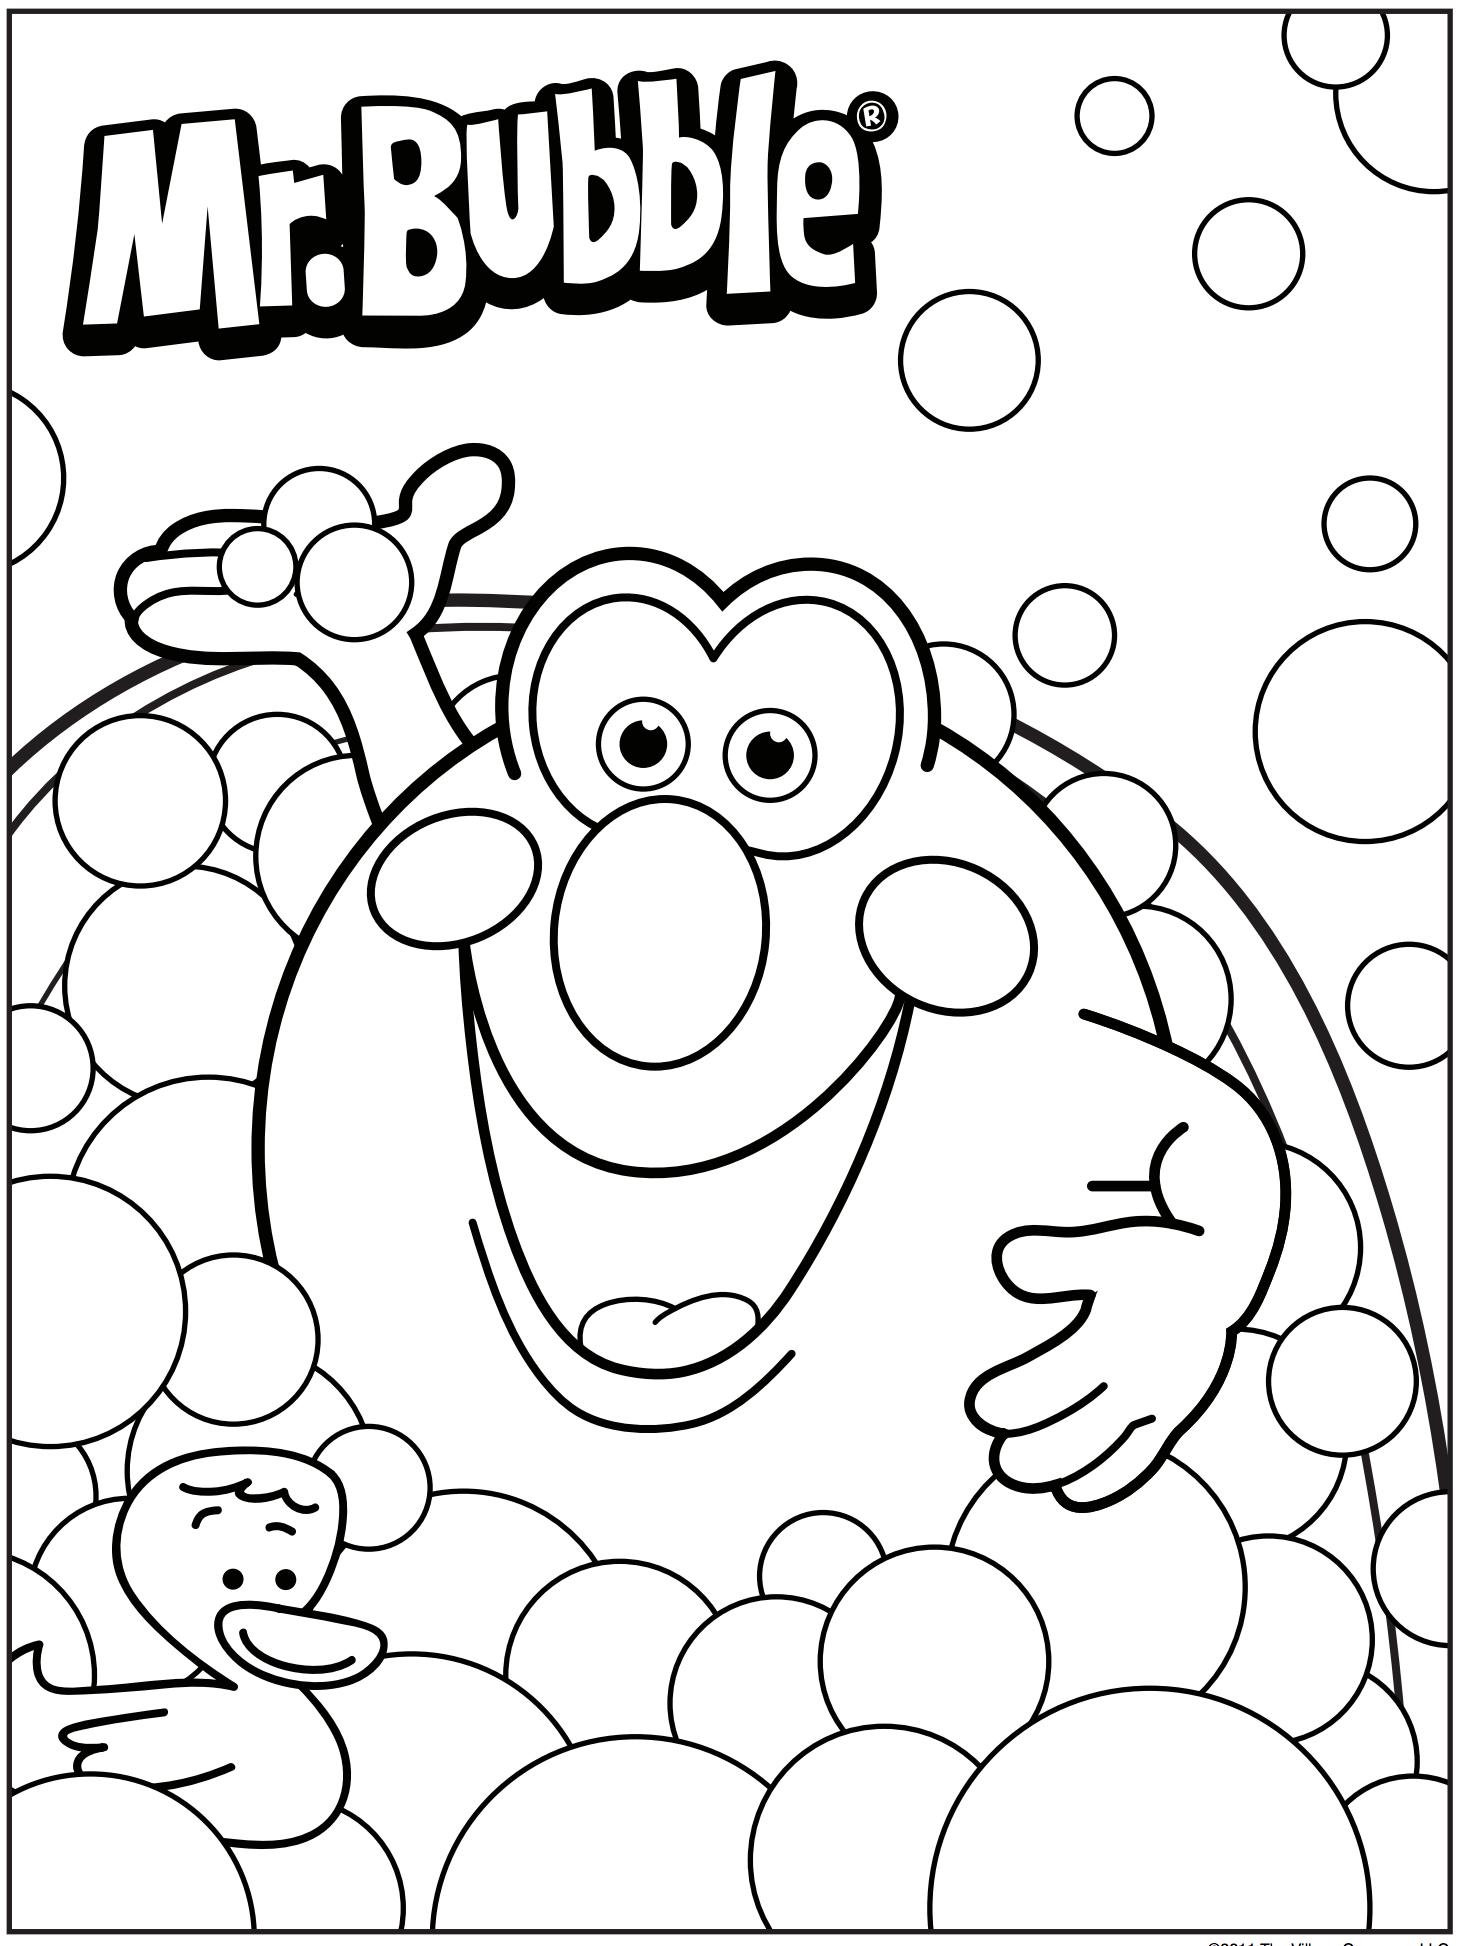 Coloring pages of bubbles ~ Bath Time 3D Coloring Pages | Coloring pages | Coloring ...